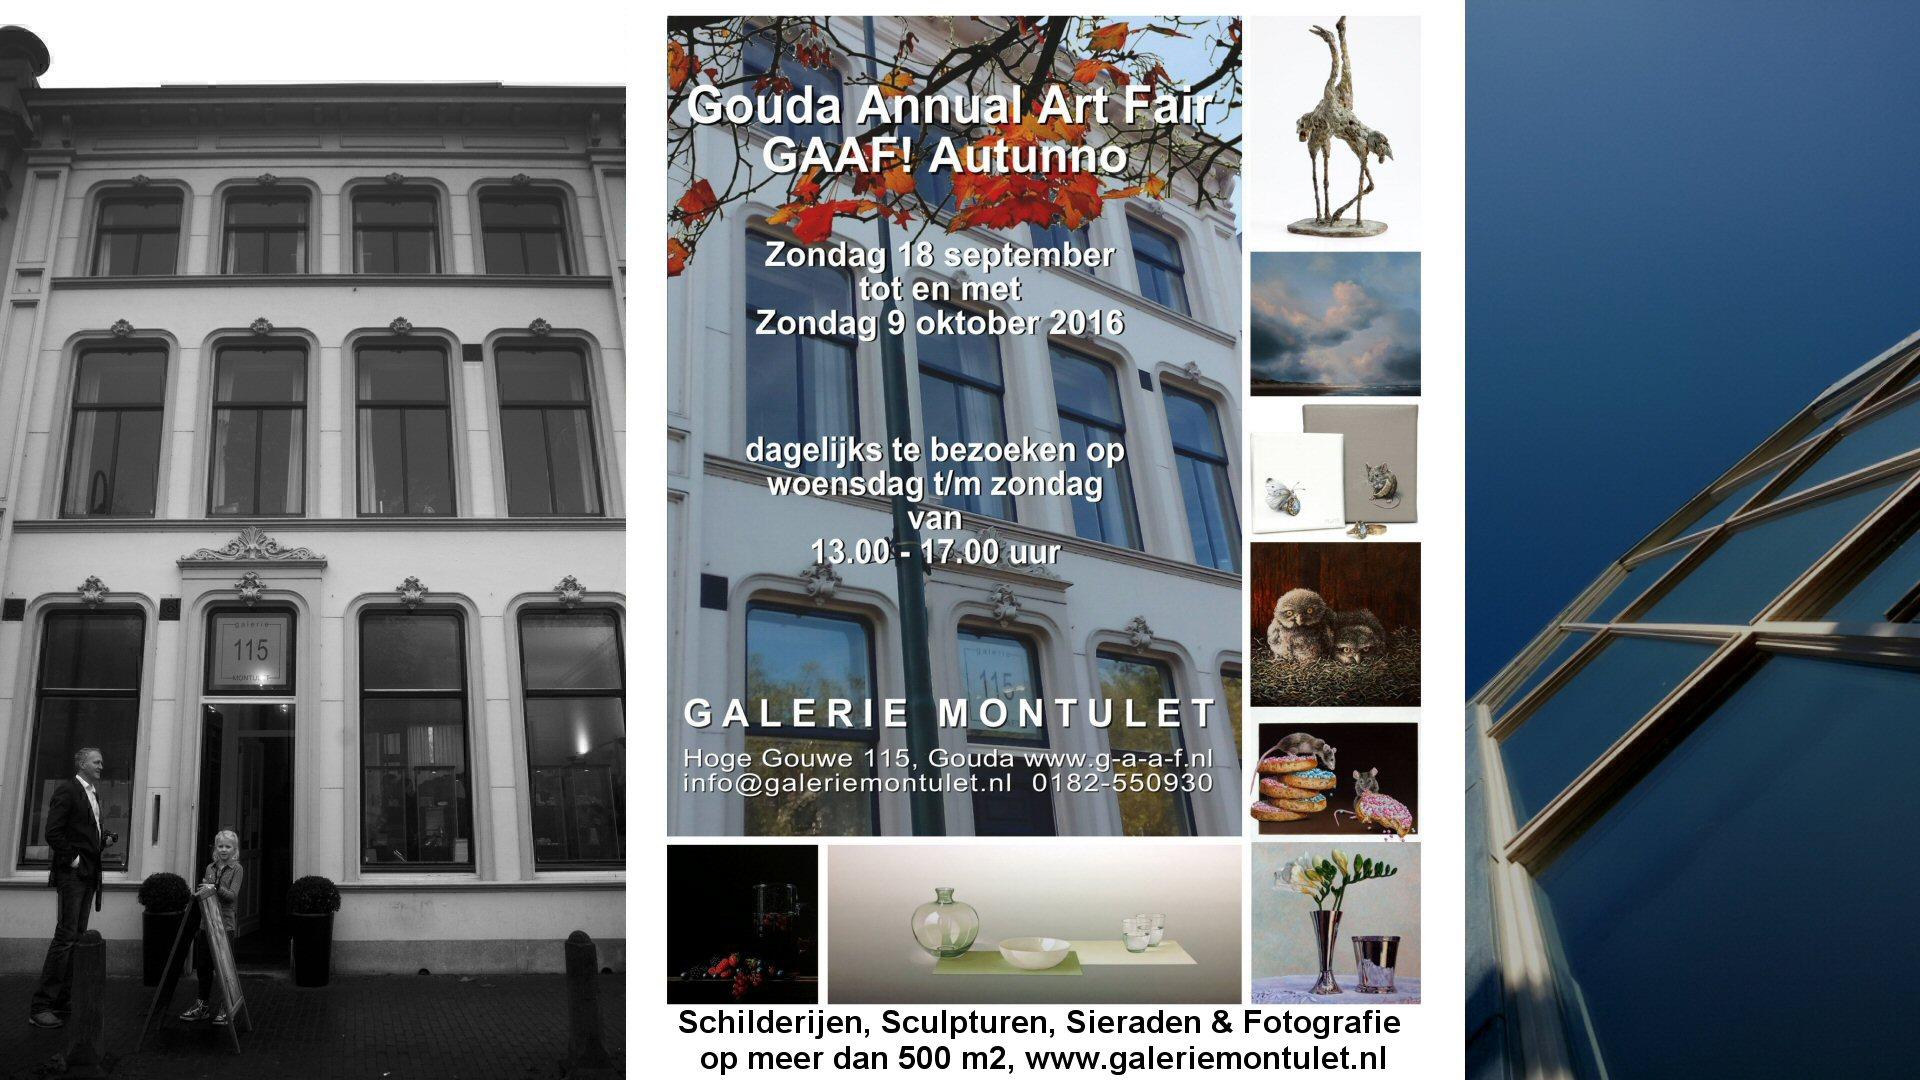 galerie-montulet-voorpagina-gaaf-autunno-2016-2